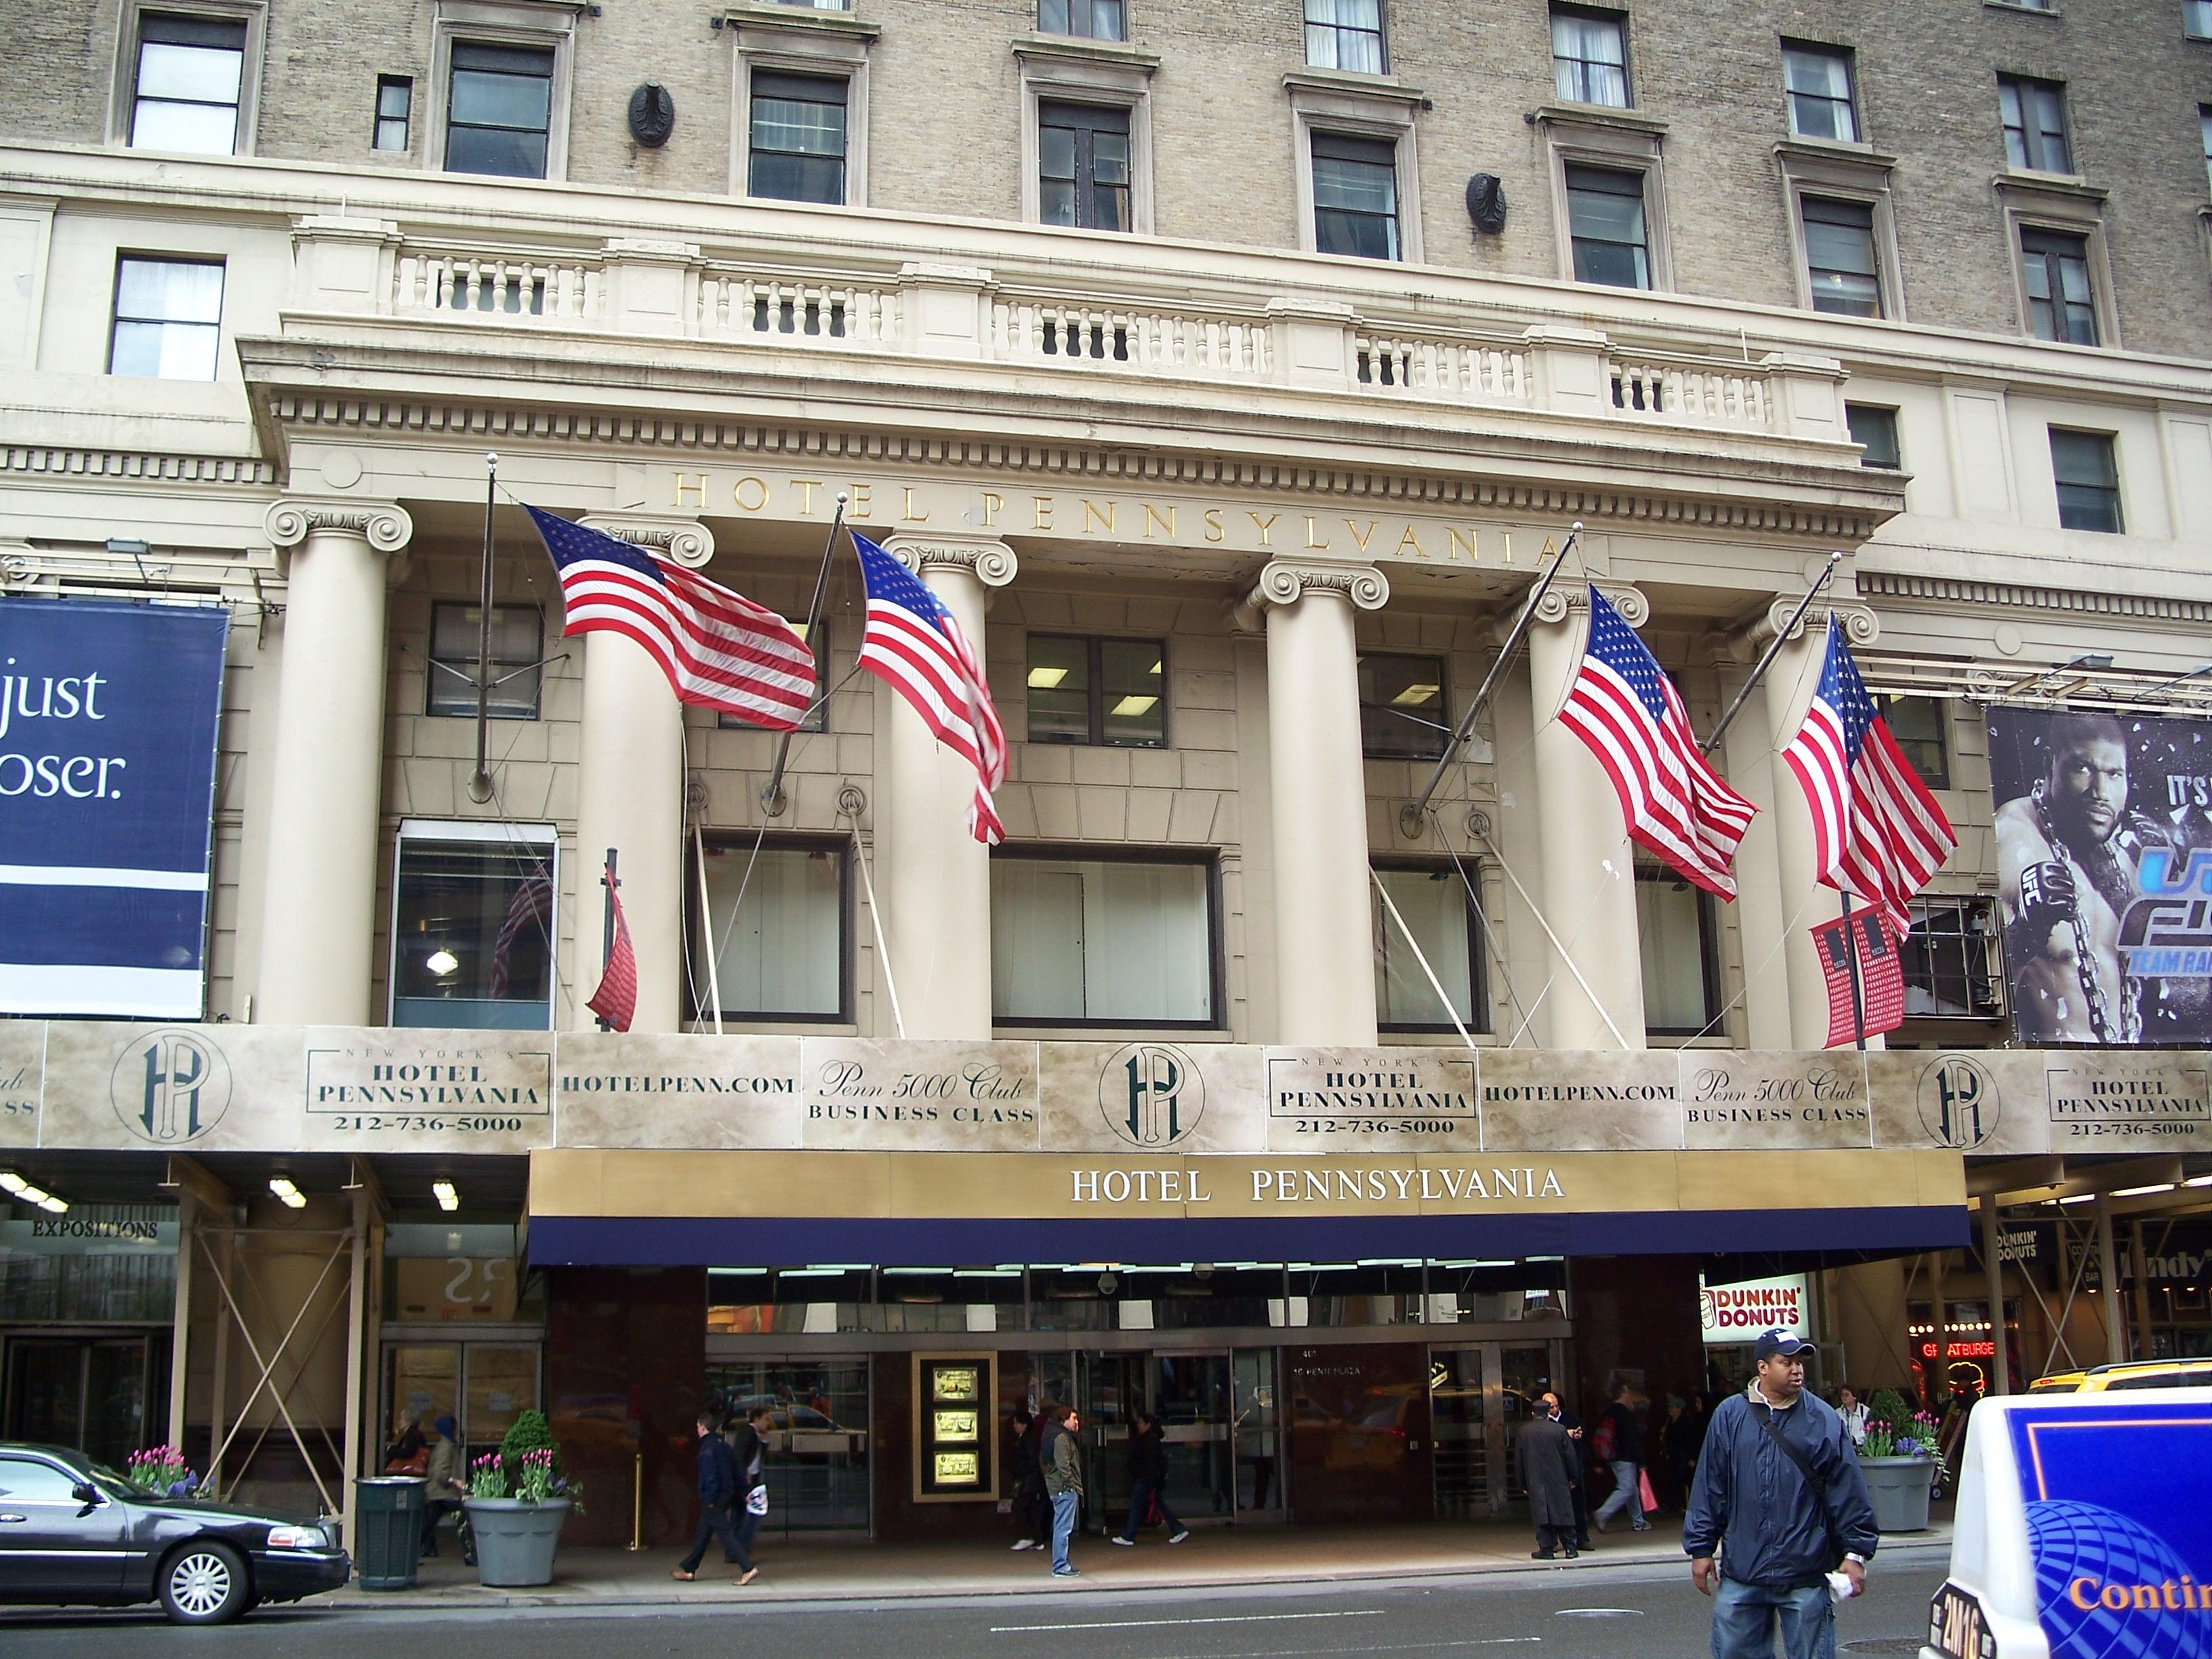 Photo Taken By Http Michaelminn Newyork Areas Midtown Hotel Pennsylvania Index Html